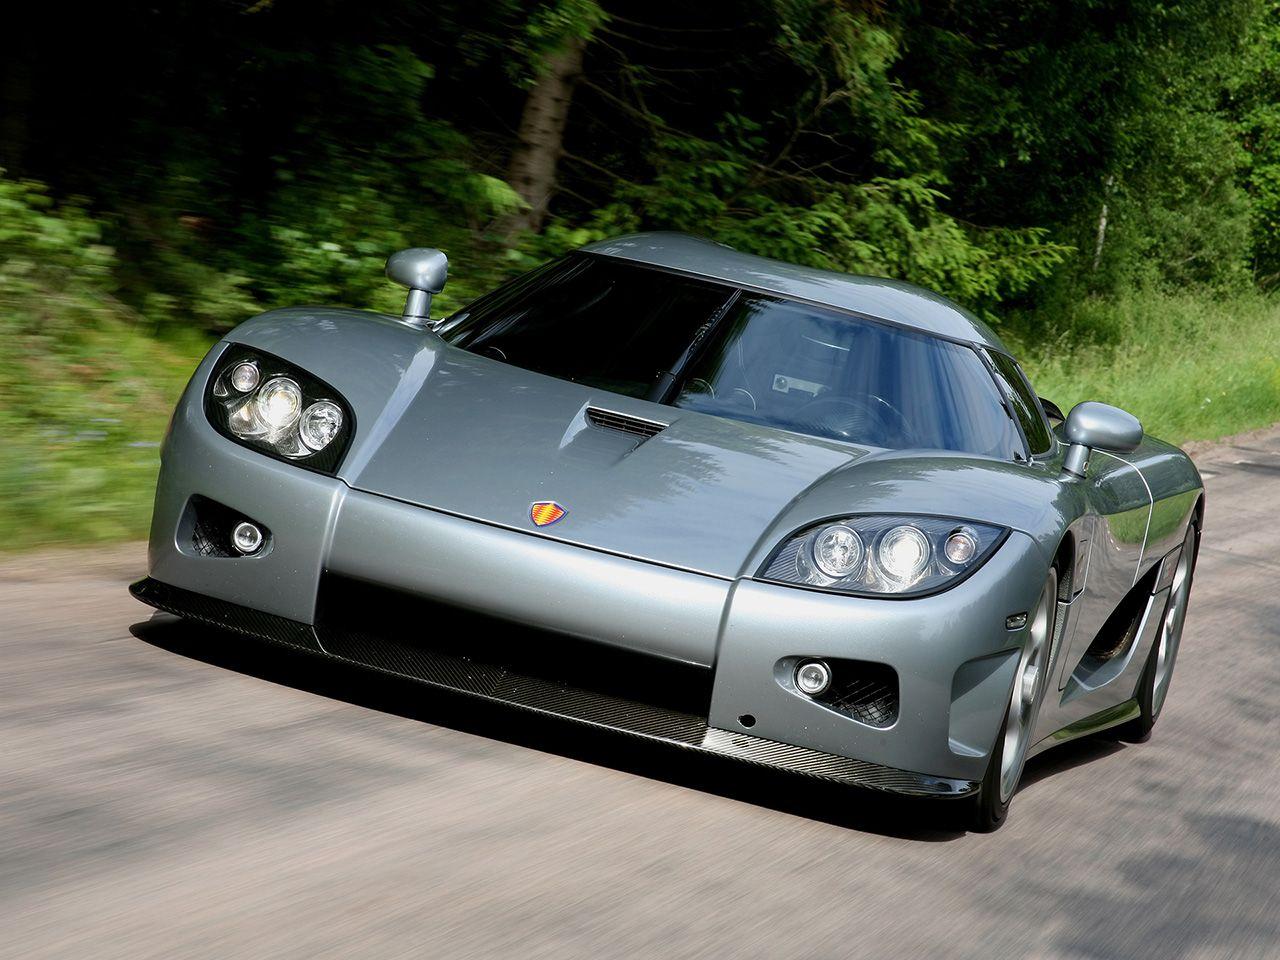 Kioenigsegg 550,000 | Exotic Cars | Pinterest | Exotic, Cars and ...